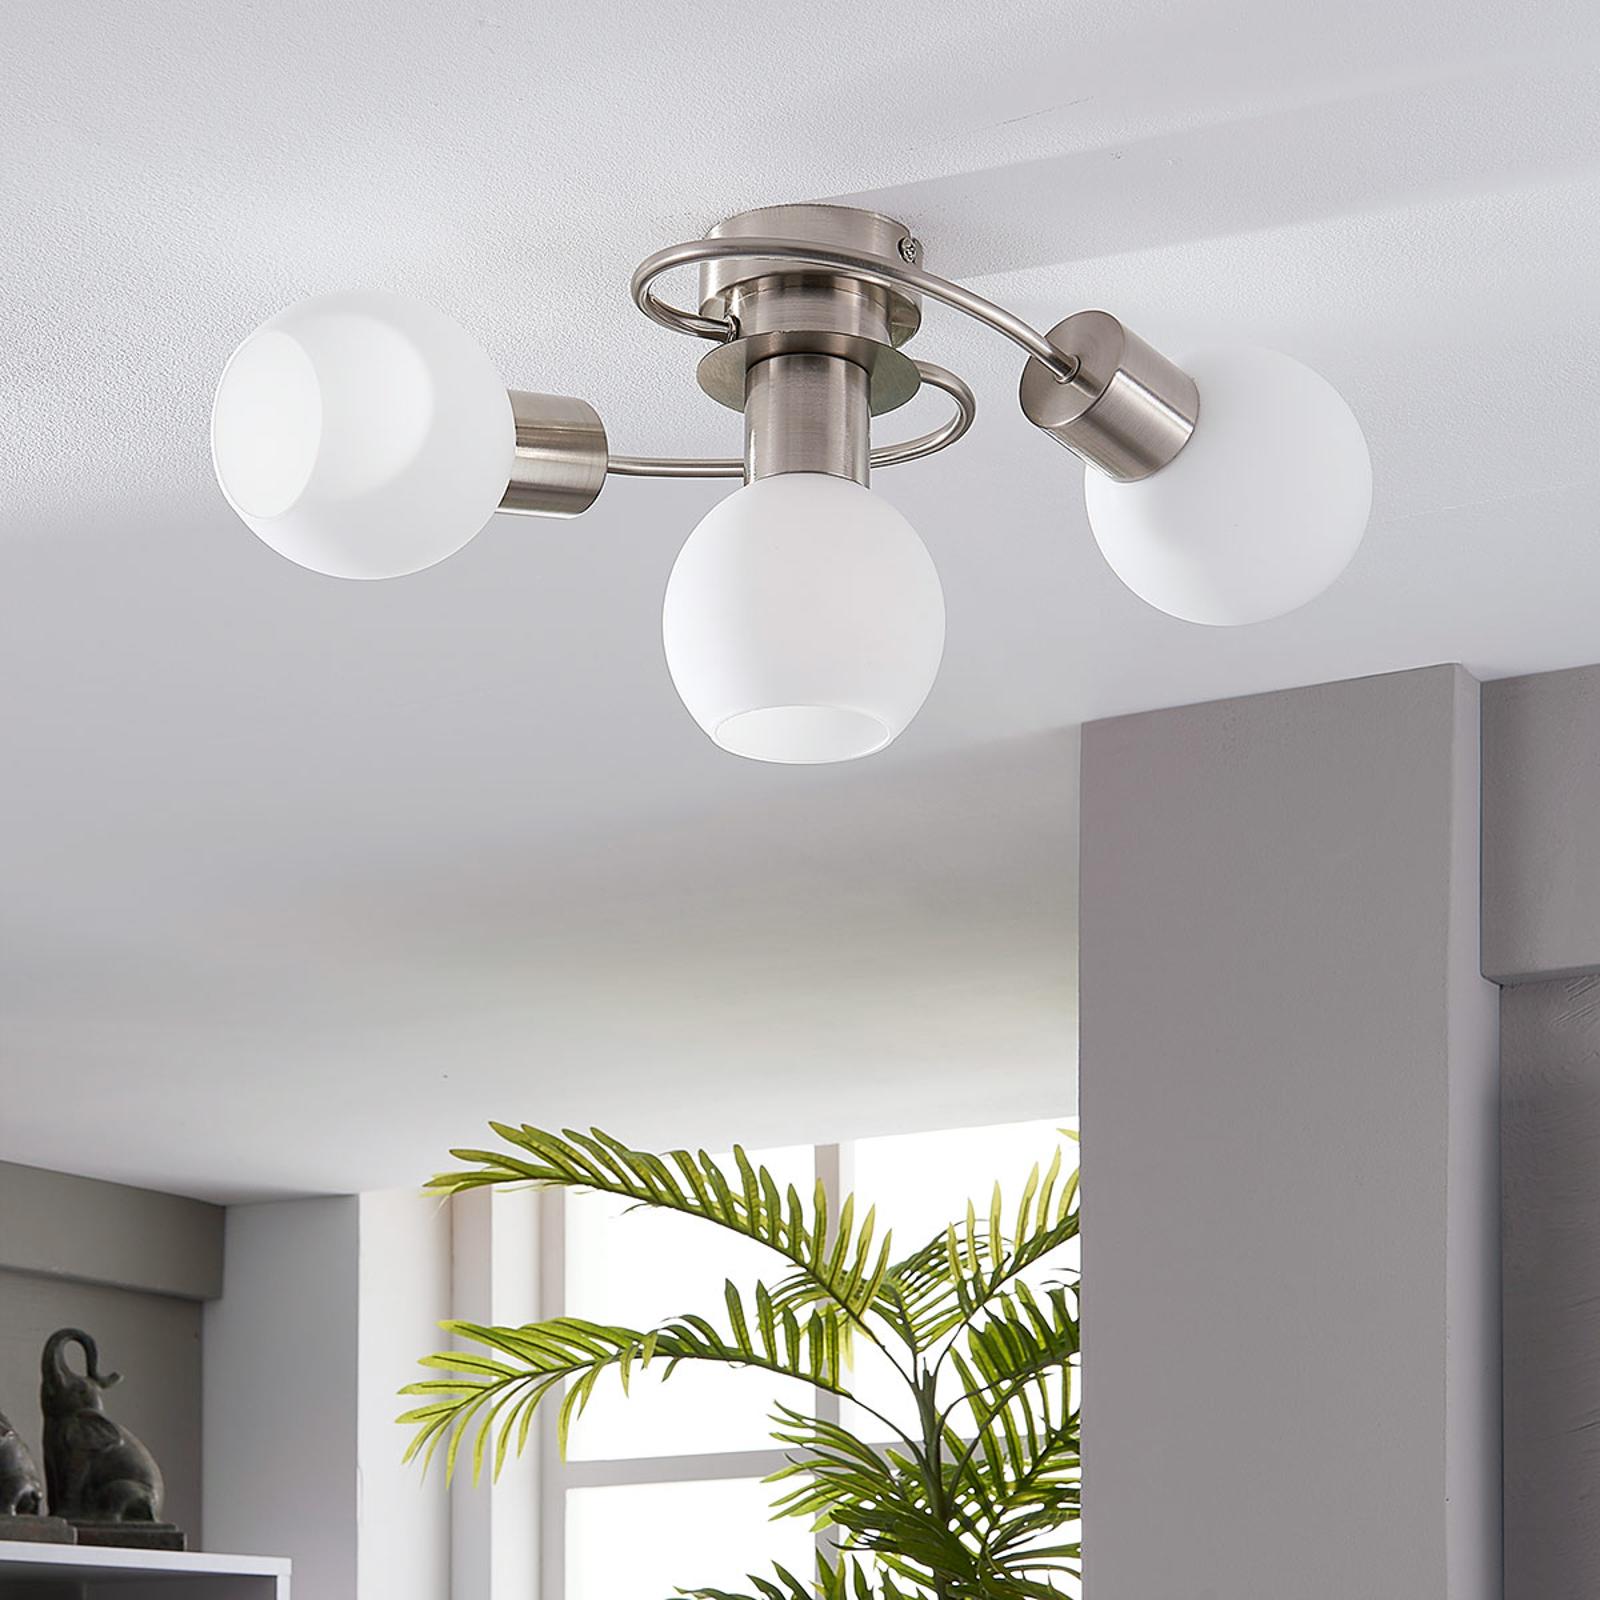 Lámpara LED de techo Ciala de 3 llamas